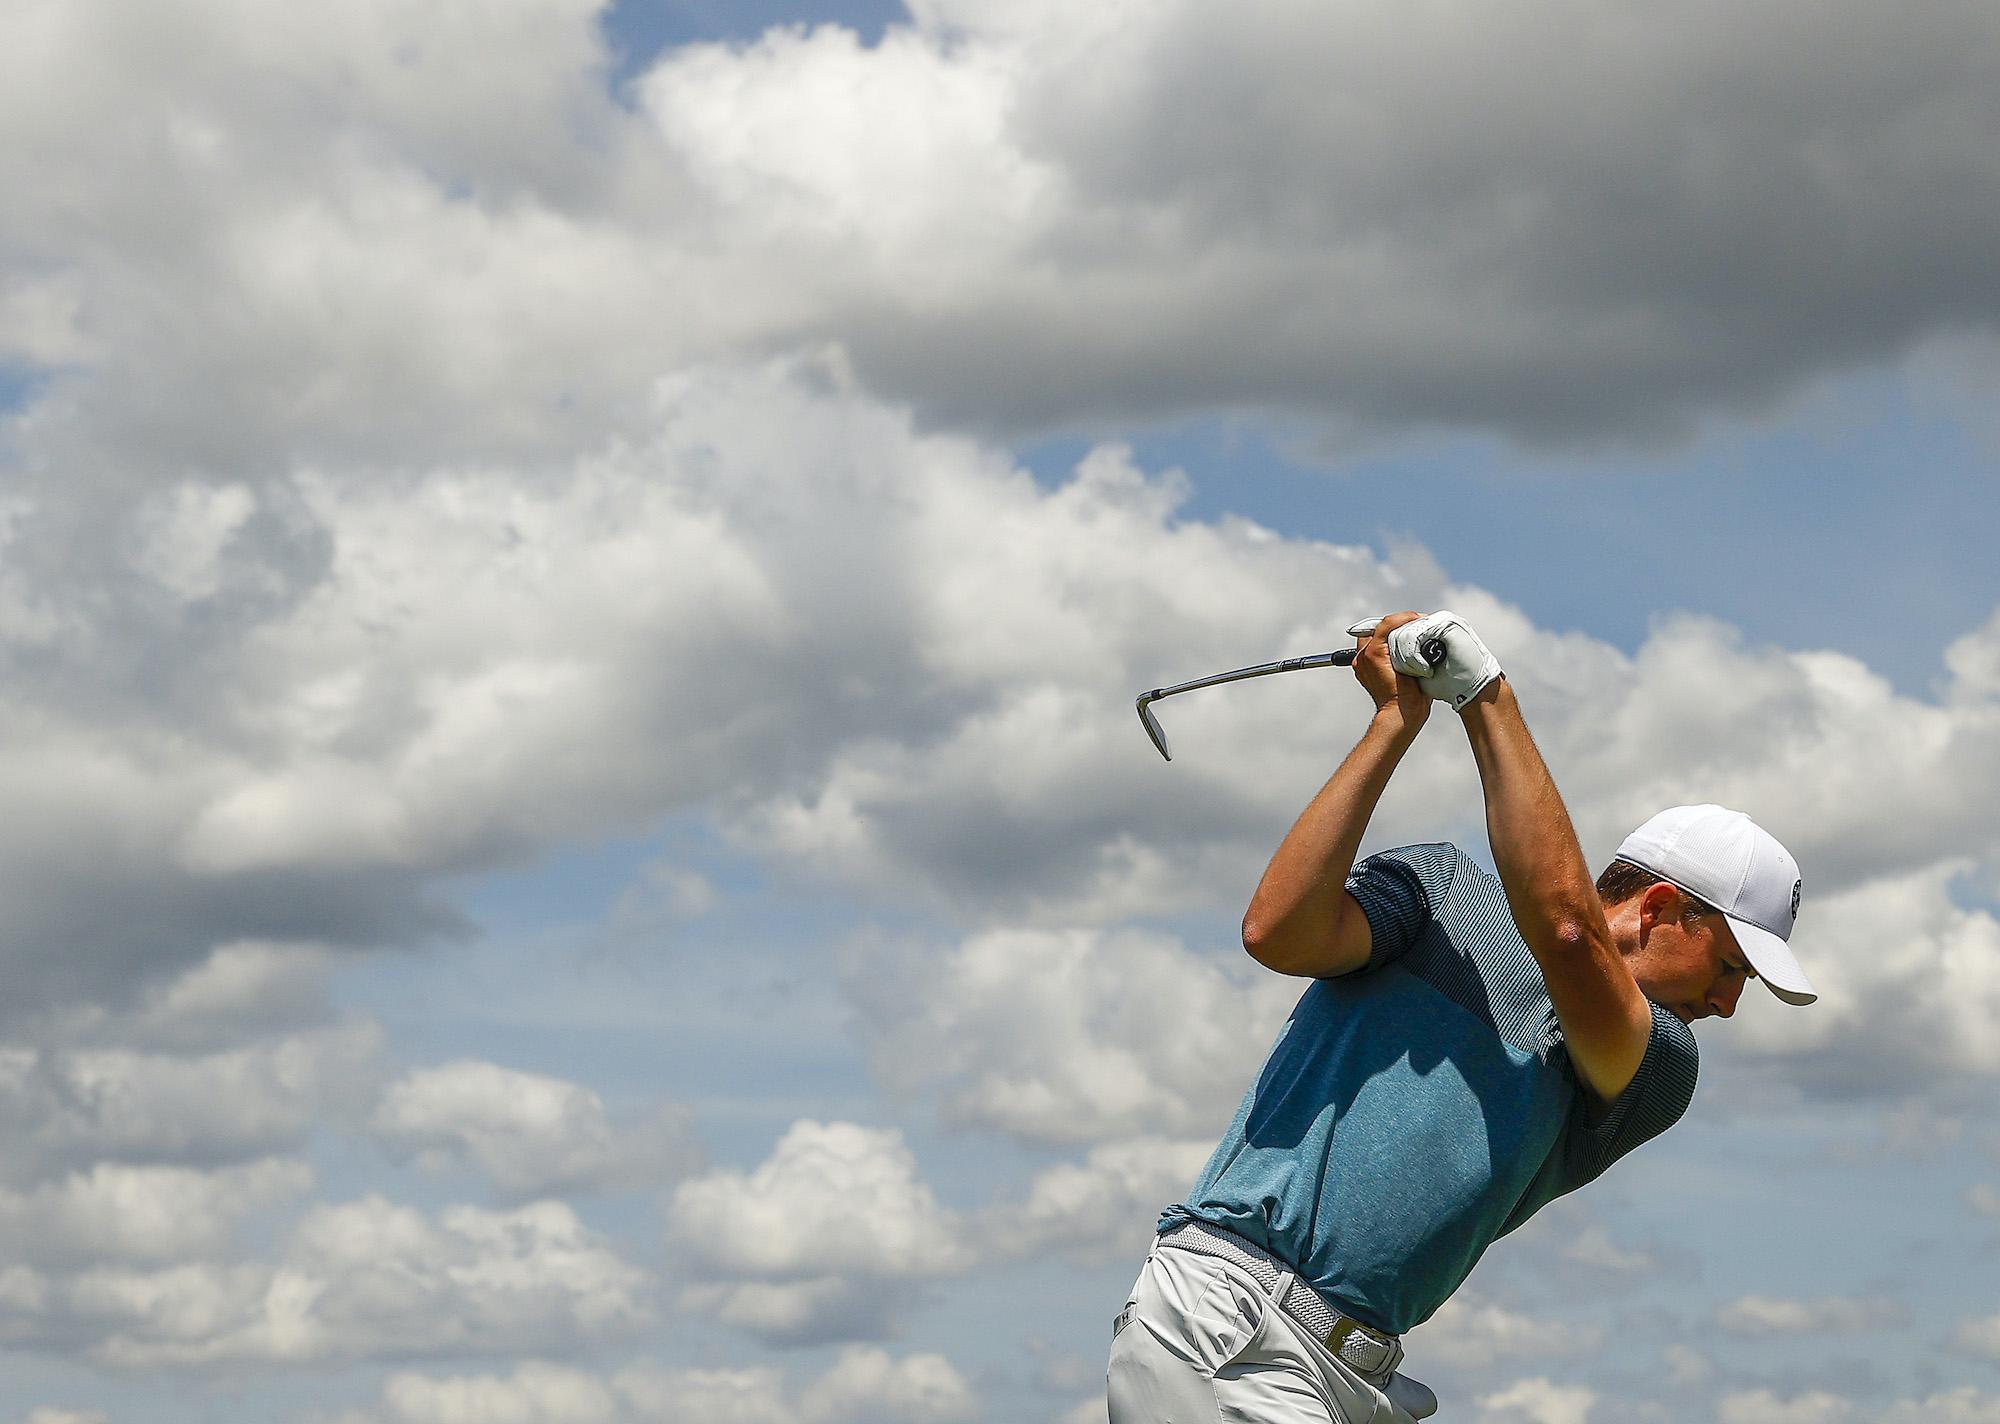 2021 PGA Championship: Round 2 - Jordan Plays His Shot from the No. 8 Tee